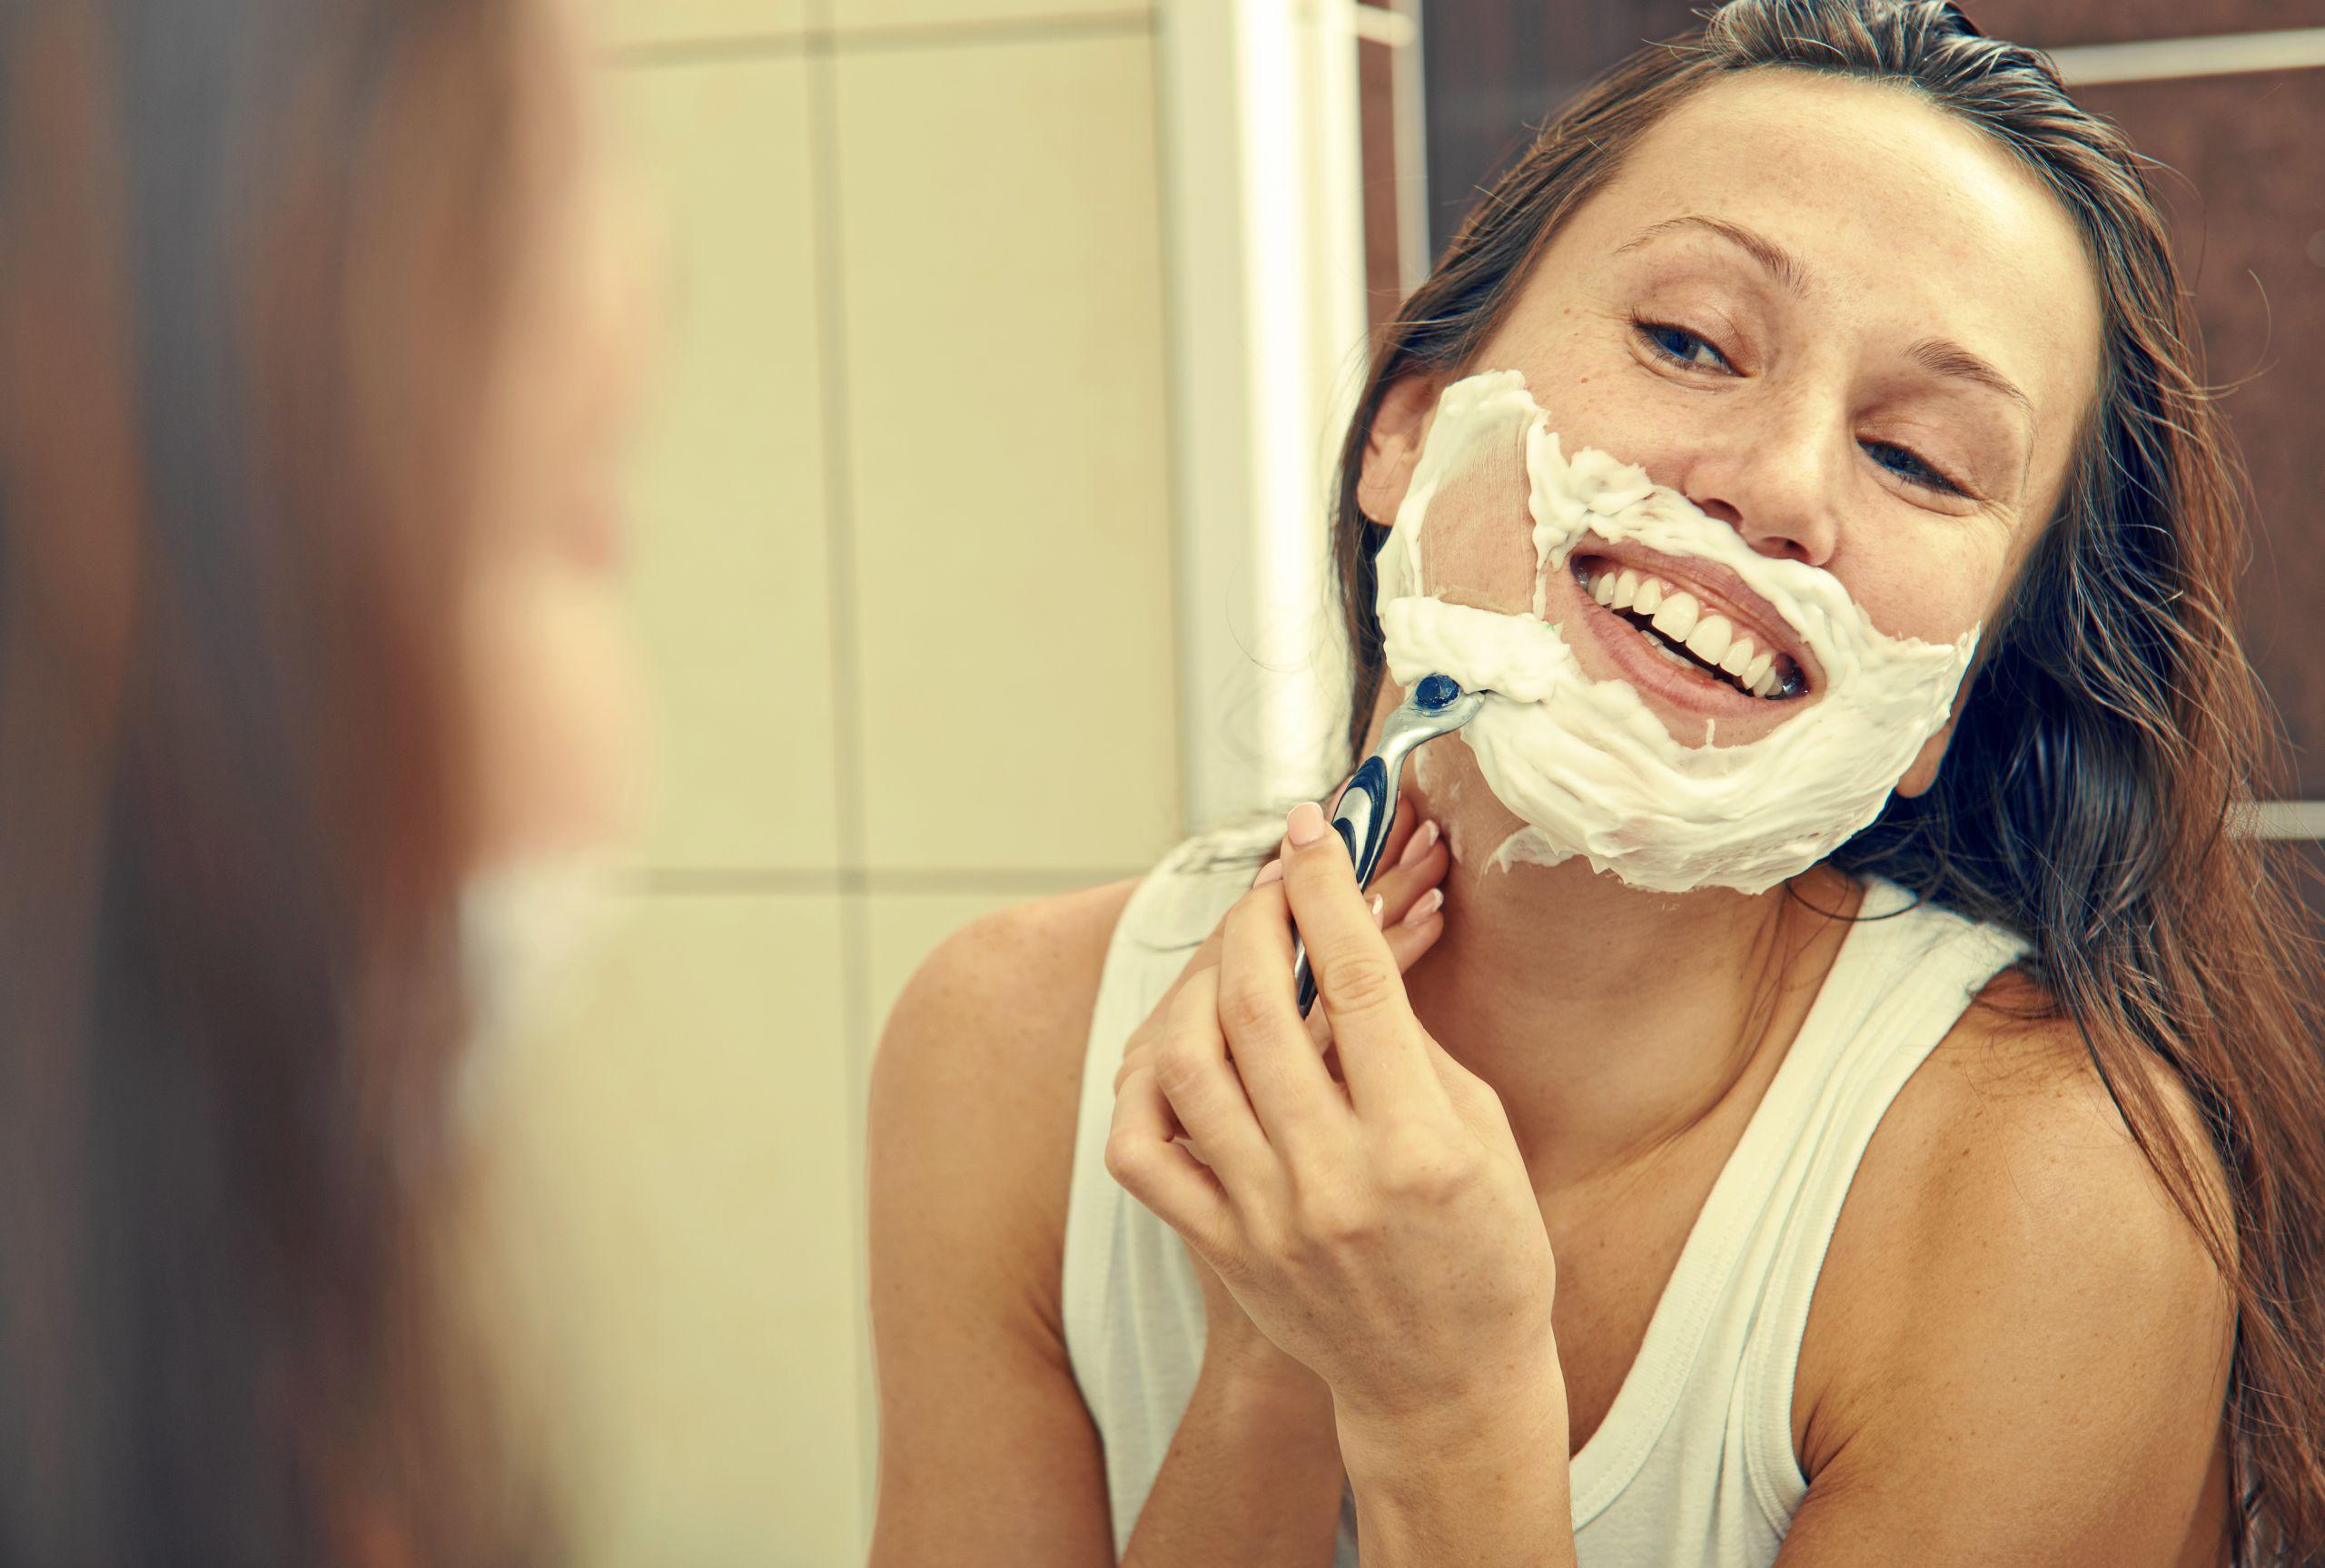 øget hårvækst kvinder